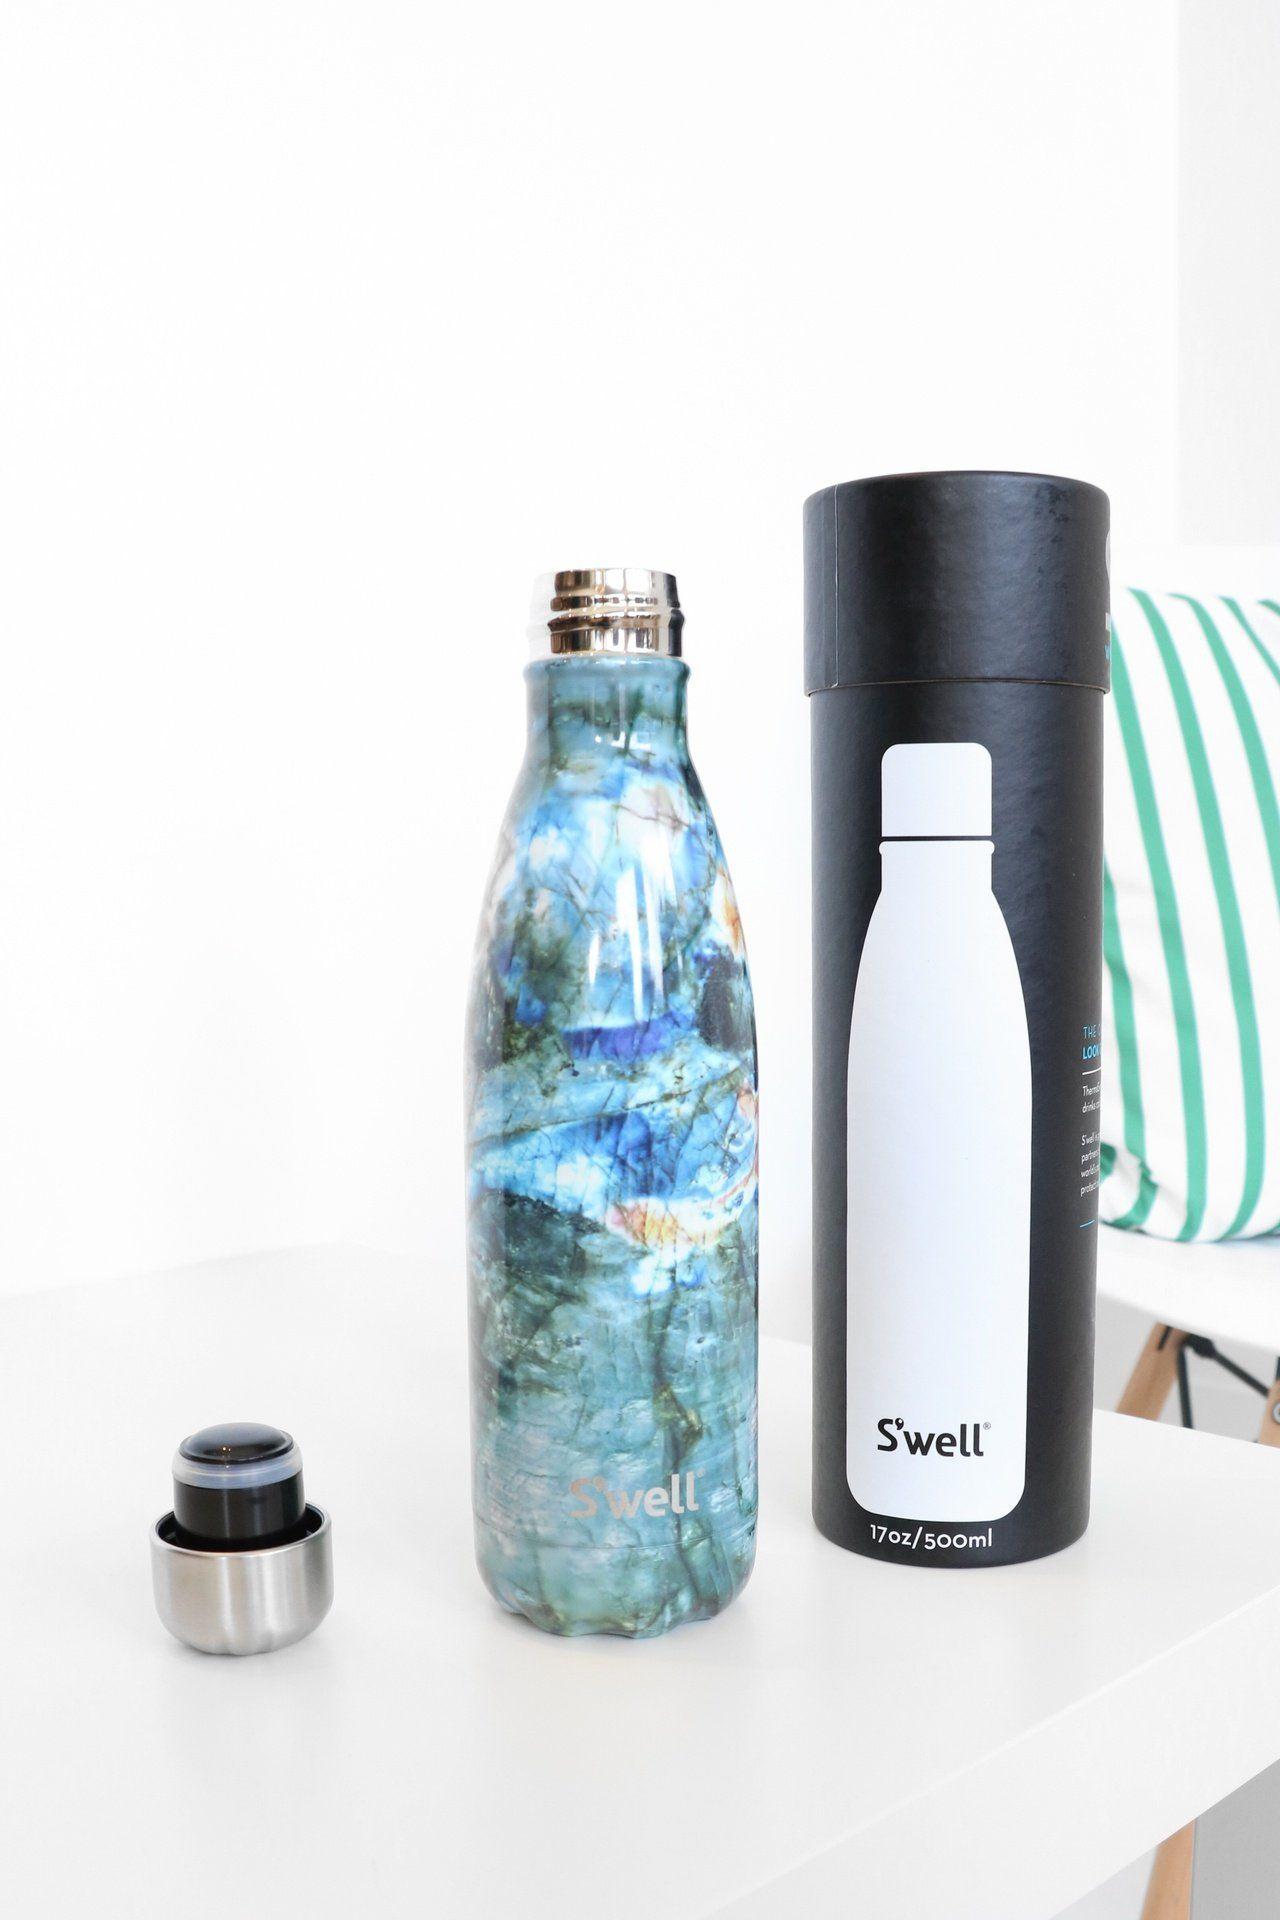 025158177b8 Labradorite 17 oz Swell Swell Water Bottle